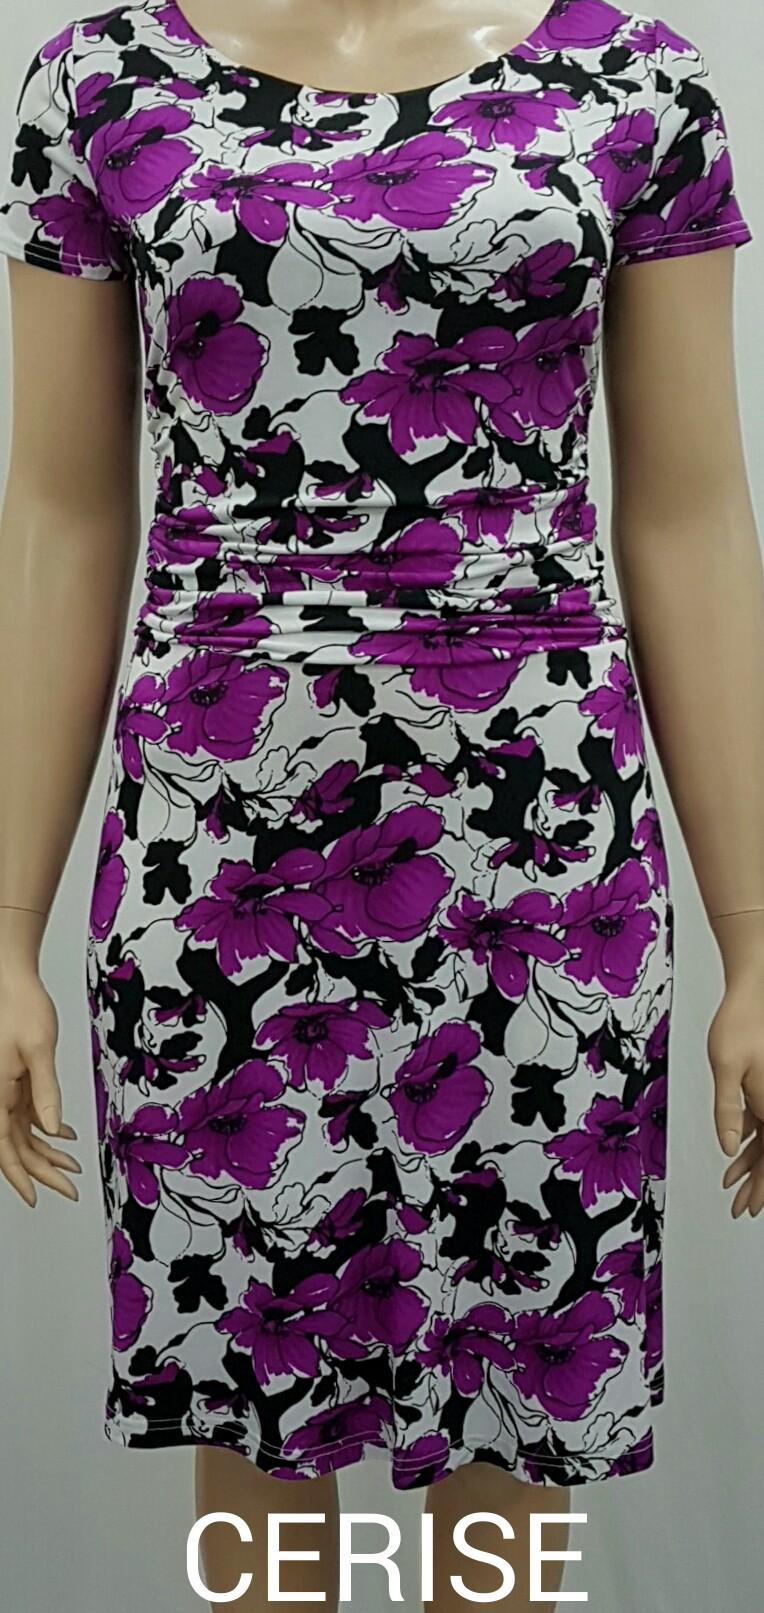 Ladies Dress 1340 Ld1340 20 00 Plus Size Clothing